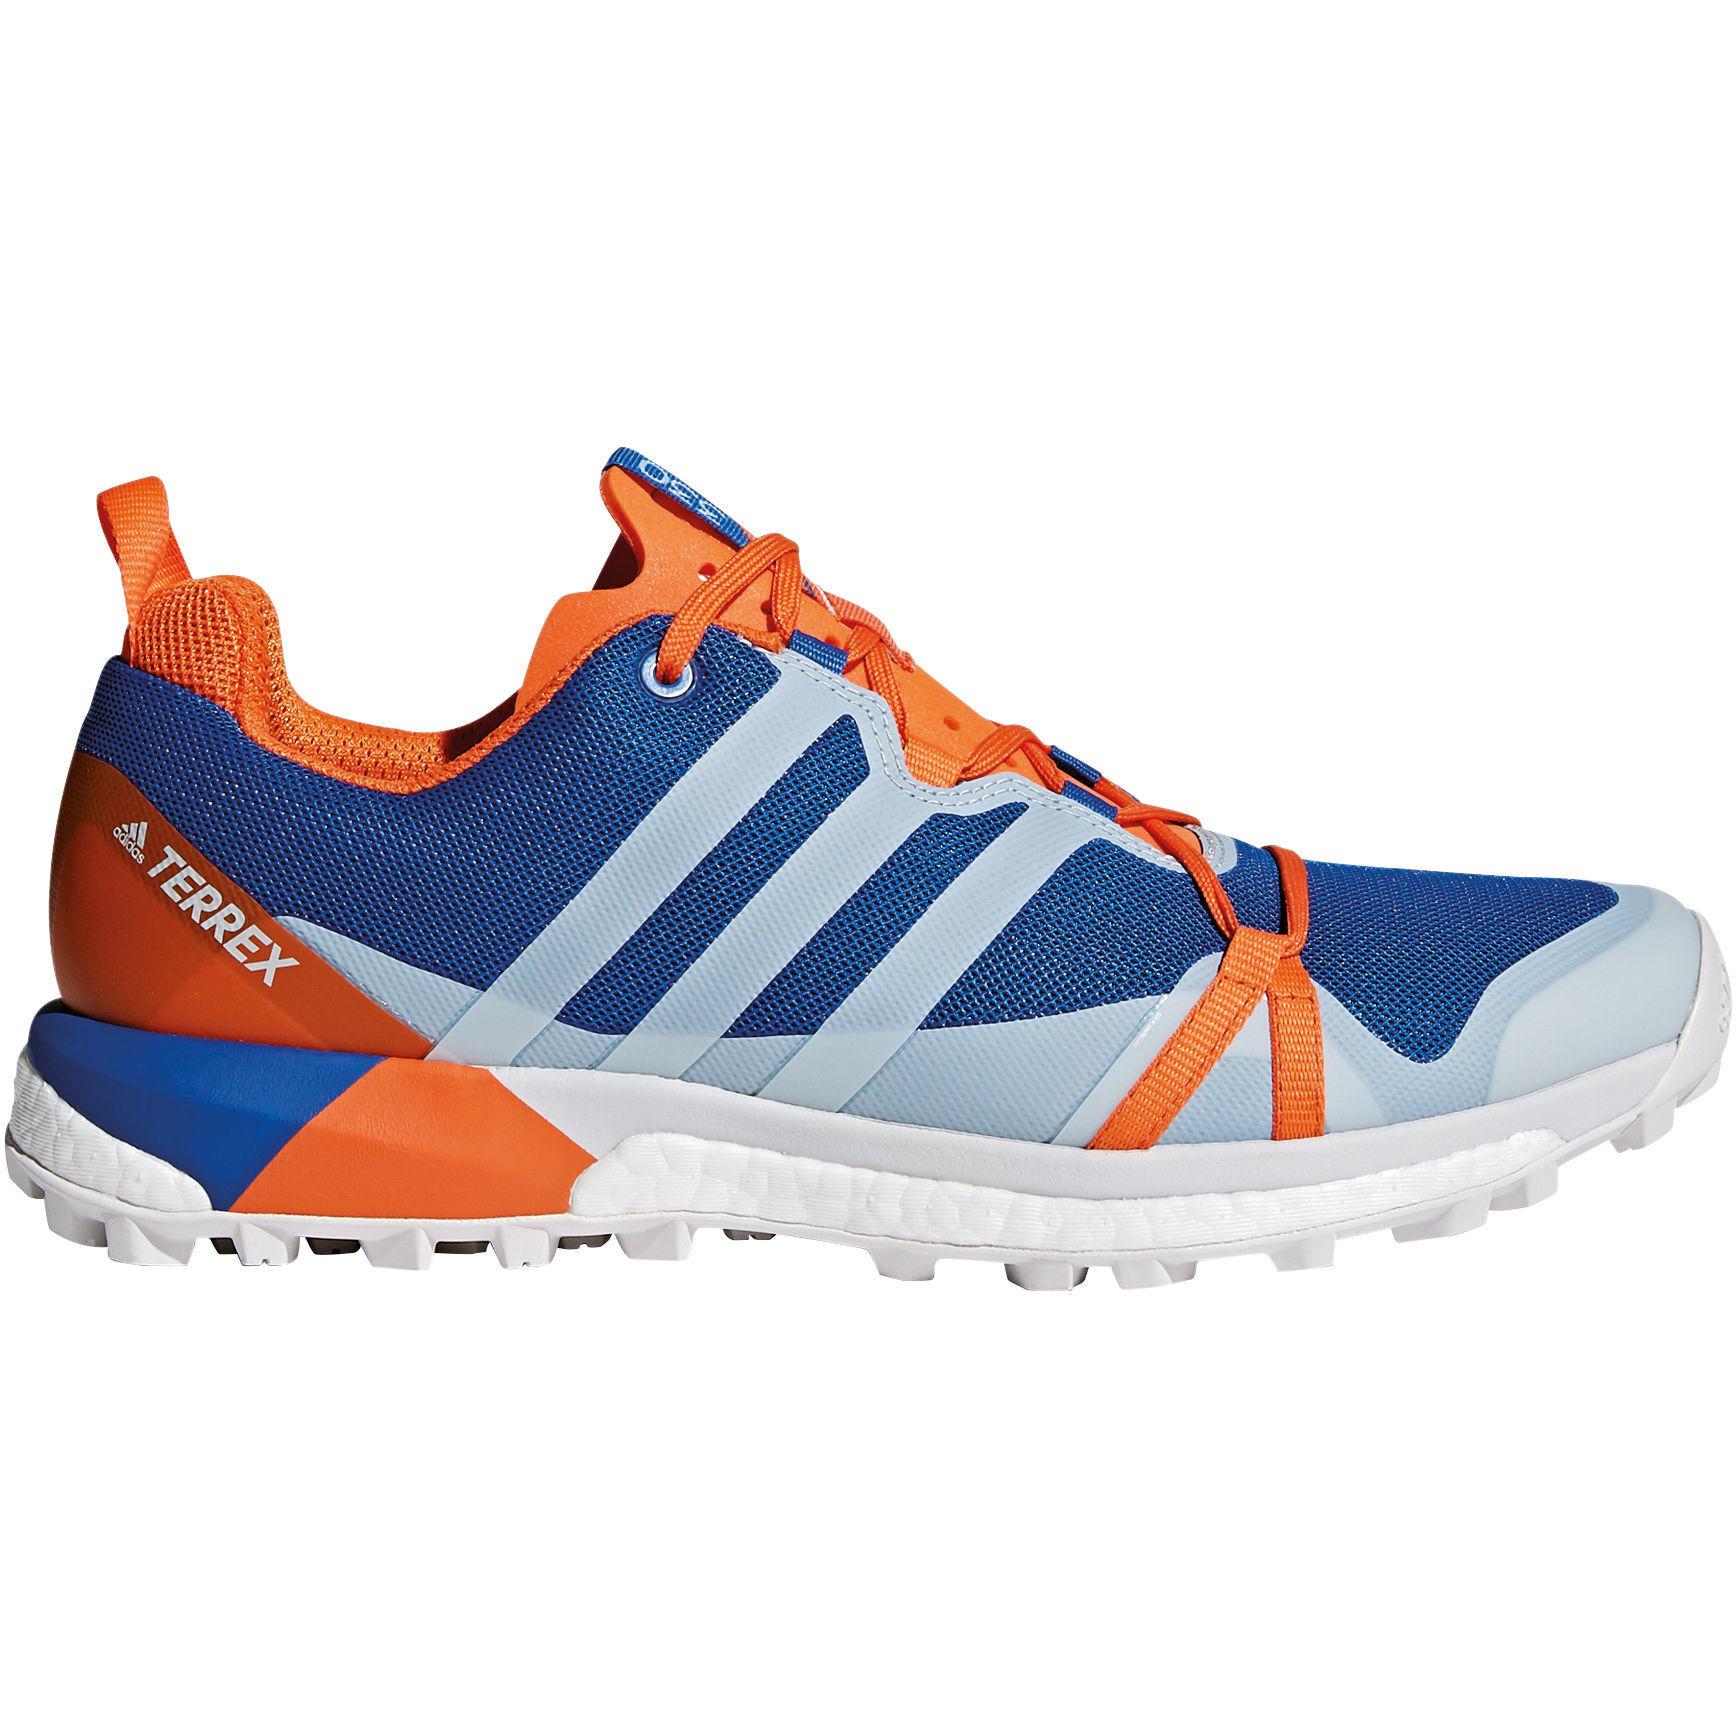 Shoes Beautygrey Herren Agravic Blue Terrex Oneorange Adidas kwO8n0P